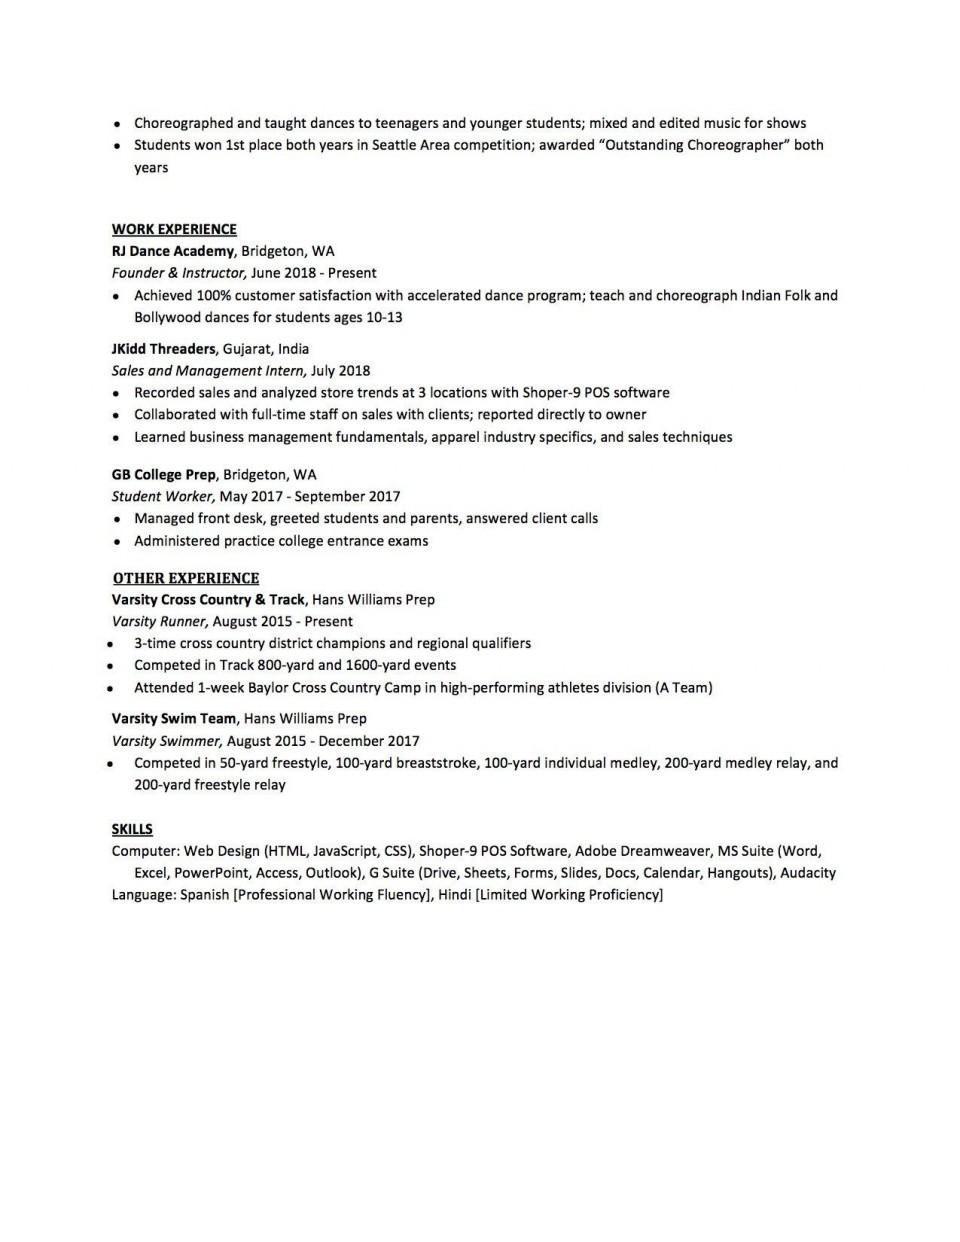 007 Sensational High School Student Resume Template Design  Free Google Doc960